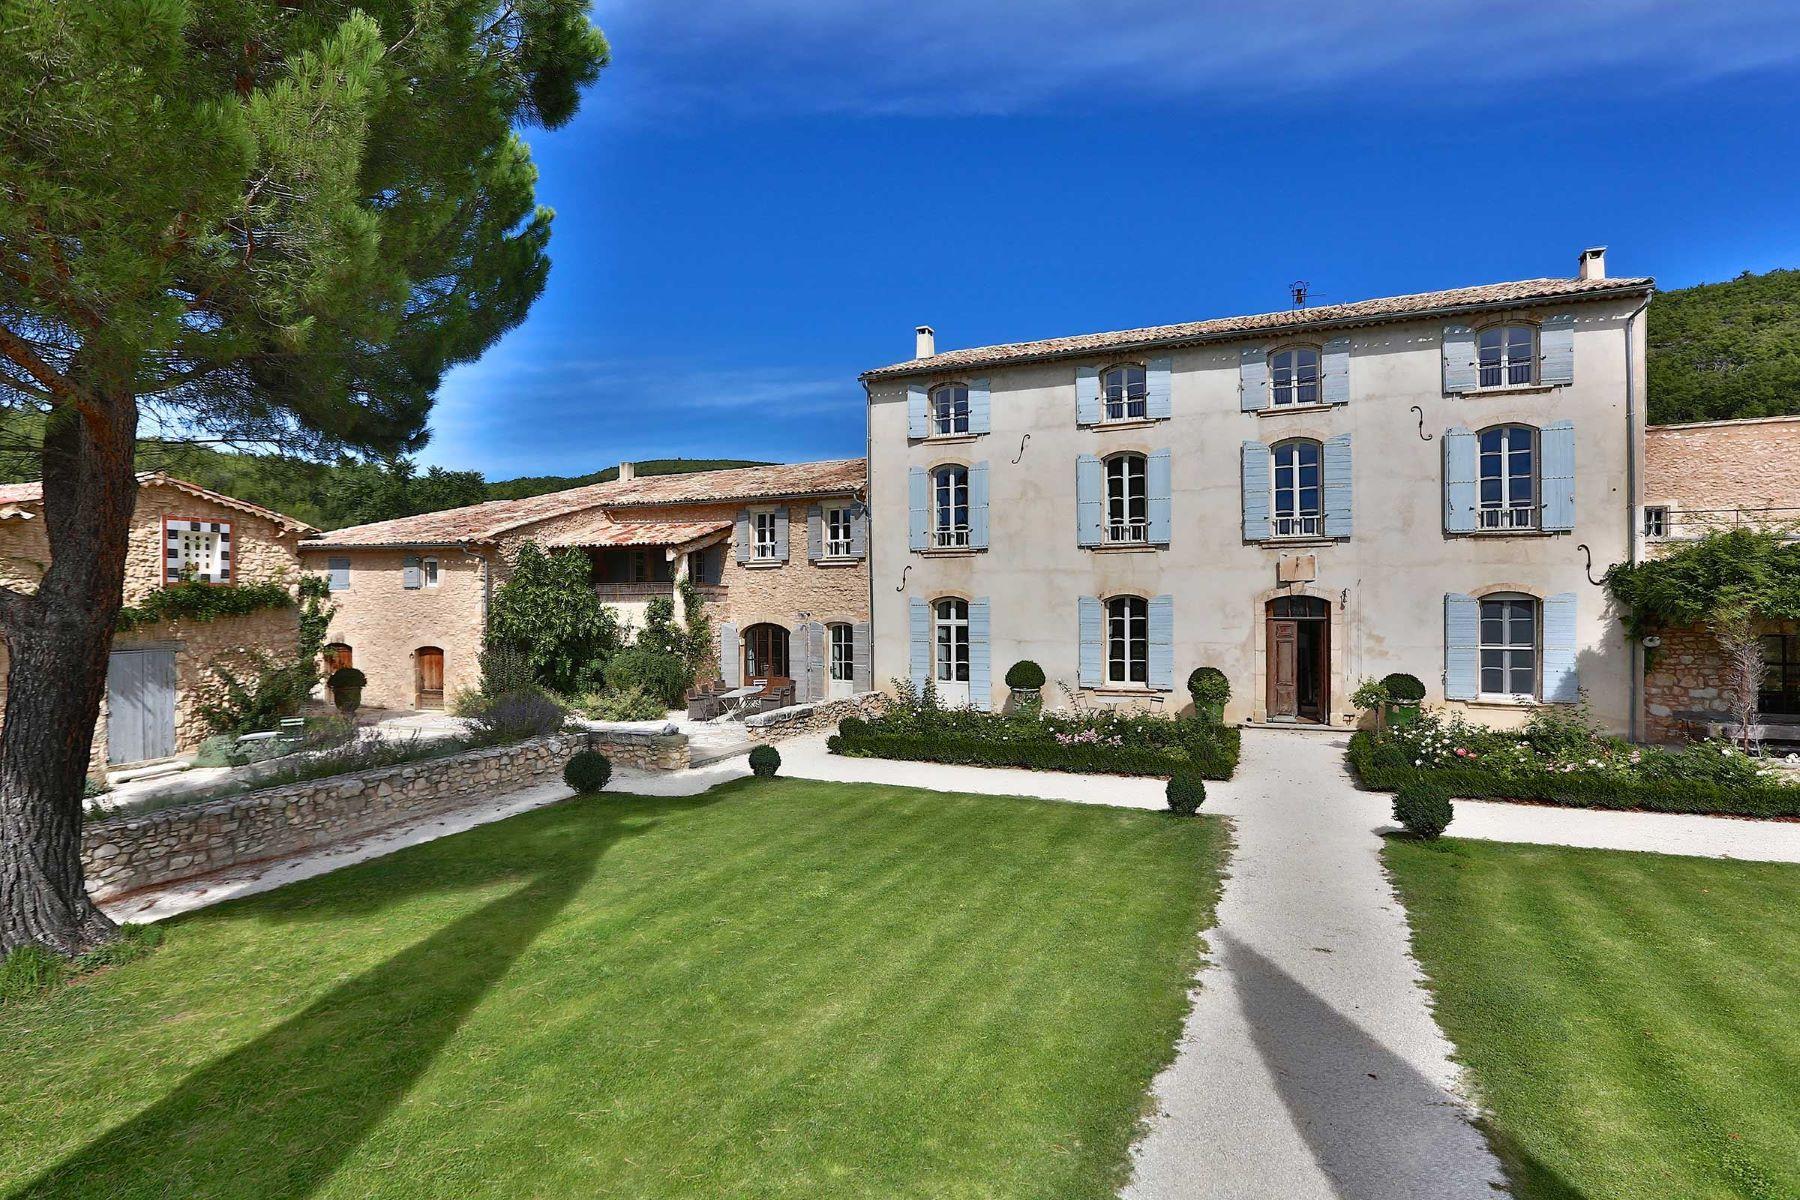 Single Family Home for Rent at Massive Bastide 18th Century for rent in haute Provence Simiane La Rotonde, Provence-Alpes-Cote D'Azur, 04150 France